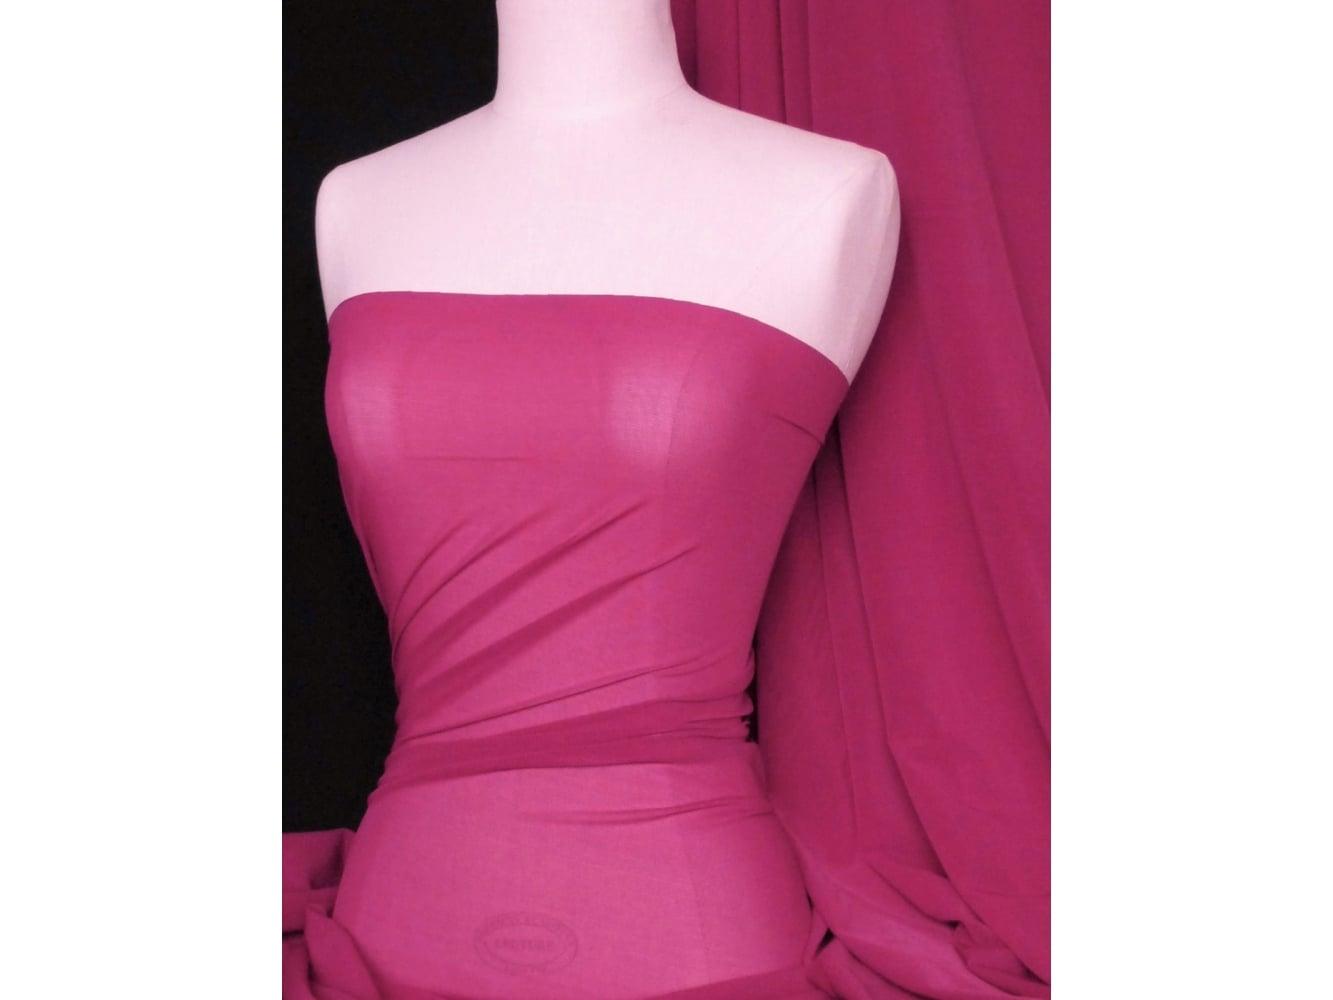 LT Power Mesh 4 Way Stretch Material- Baby Pink 109 LT BPN